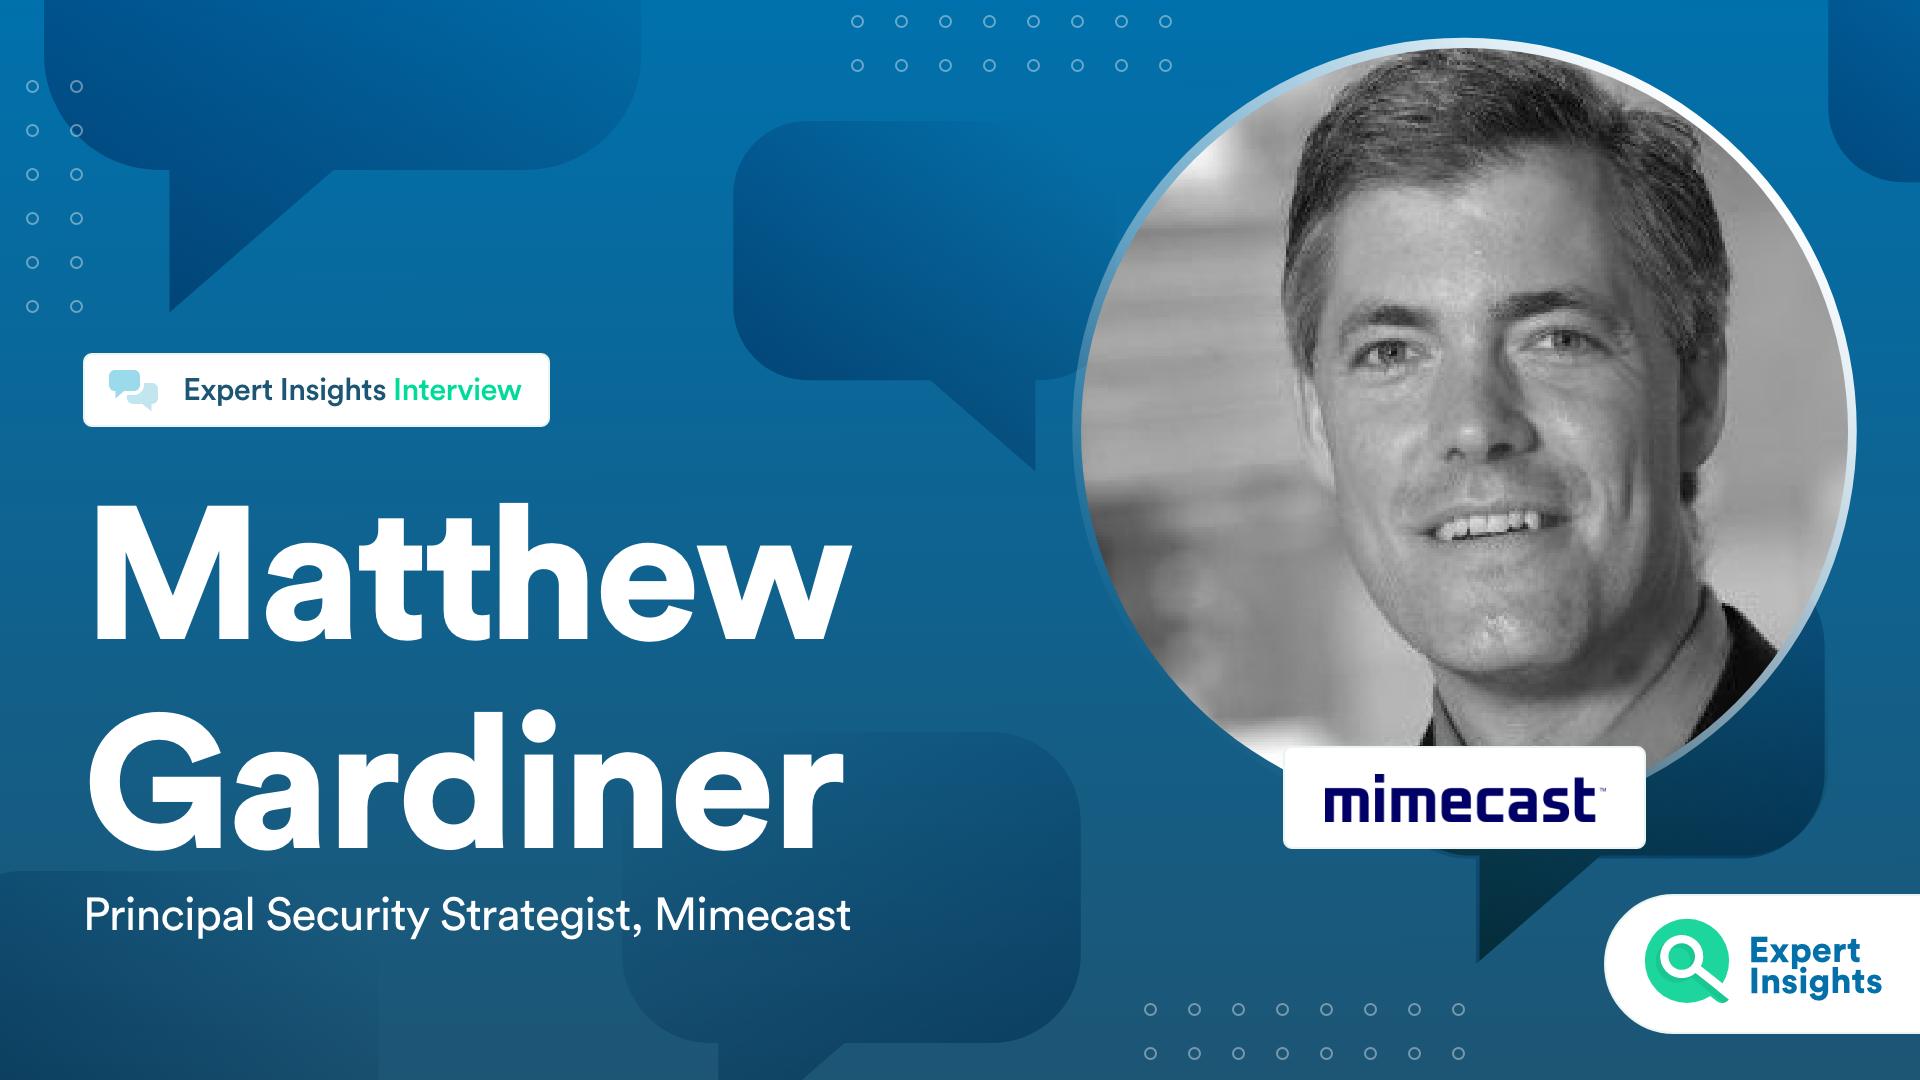 Expert Insights Interview With Matthew Gardiner Mimecast